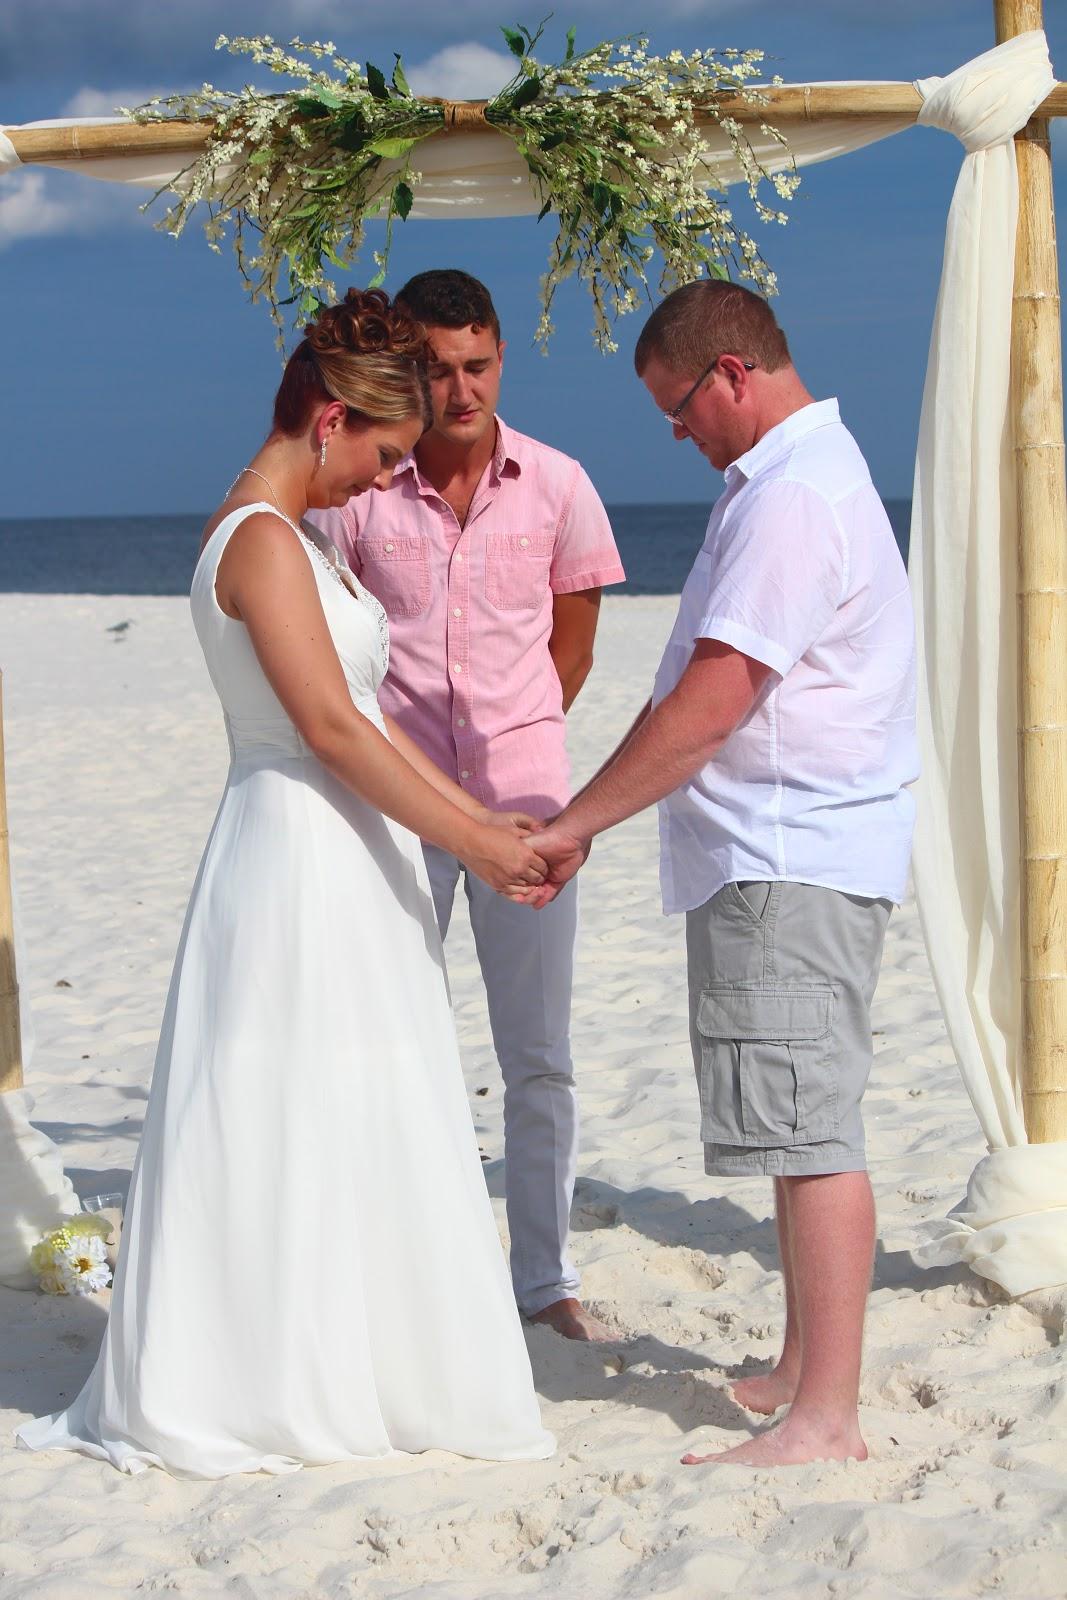 Beach Dream Wedding Of STEVEN AND KAYLA Orange Beach Alabama Beach Dream Weddings 251 504 0368